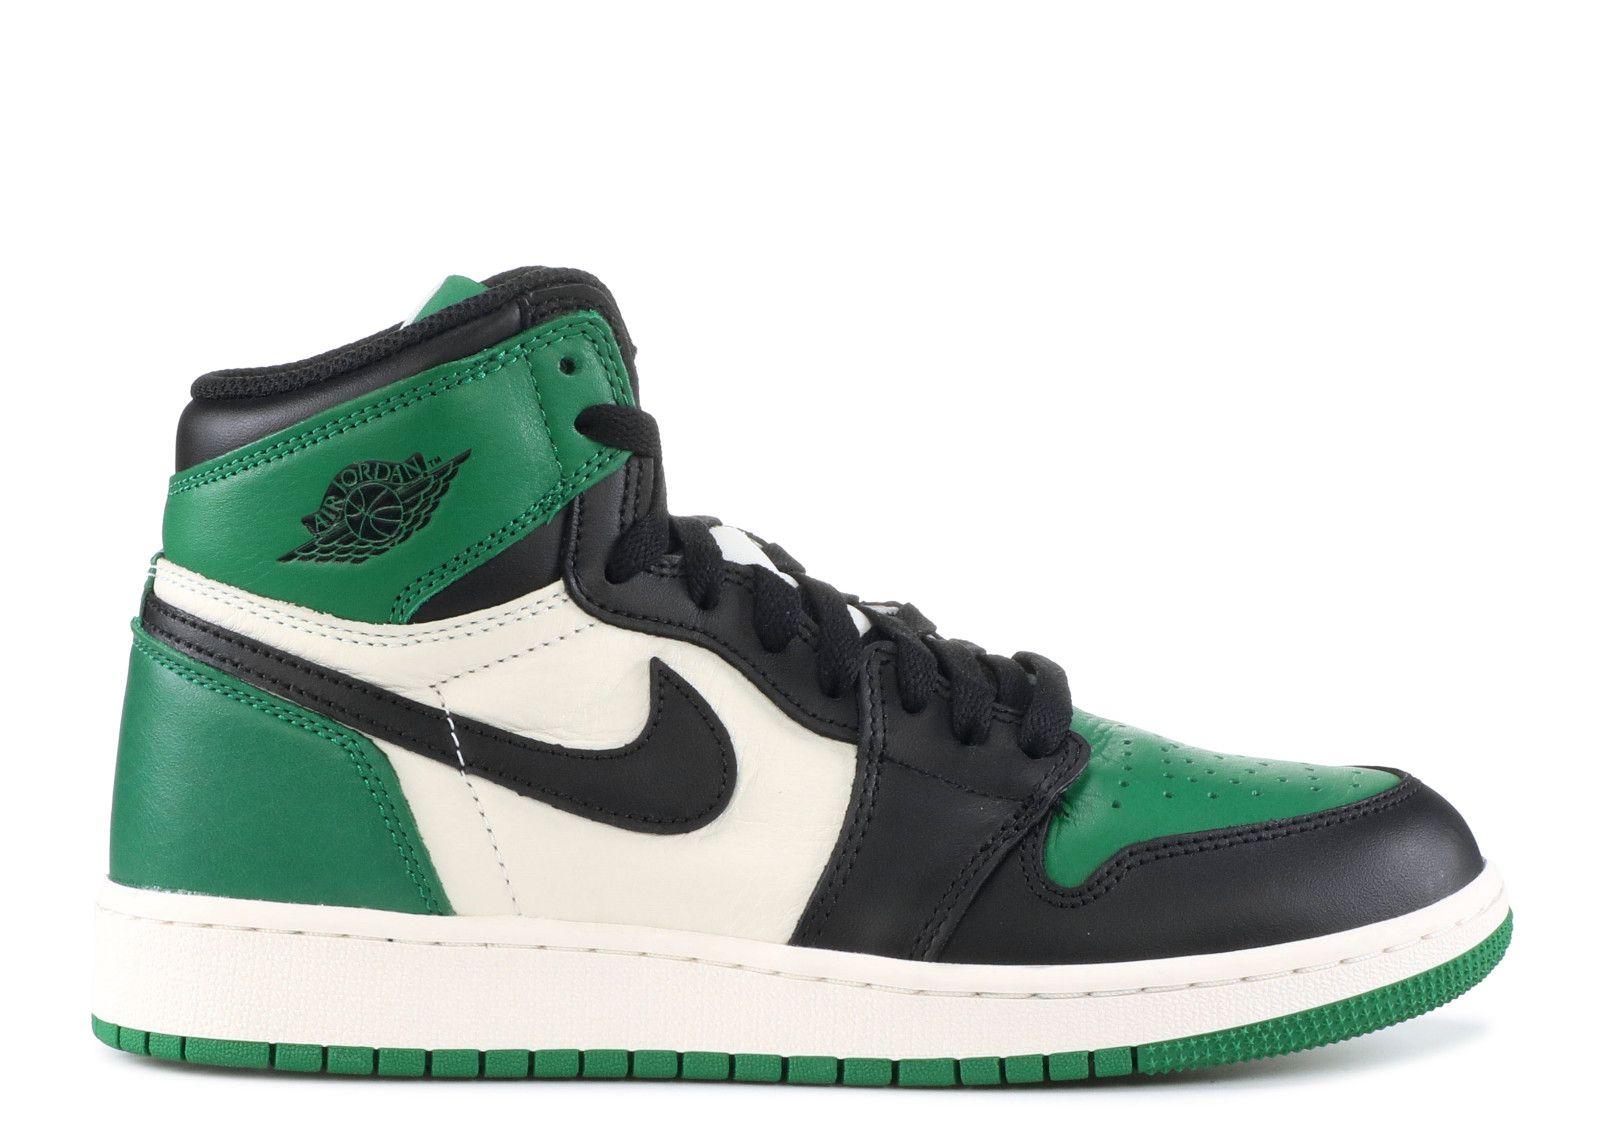 online retailer 02815 7bf57 Jordan 1 Mid Pine Green (GS)